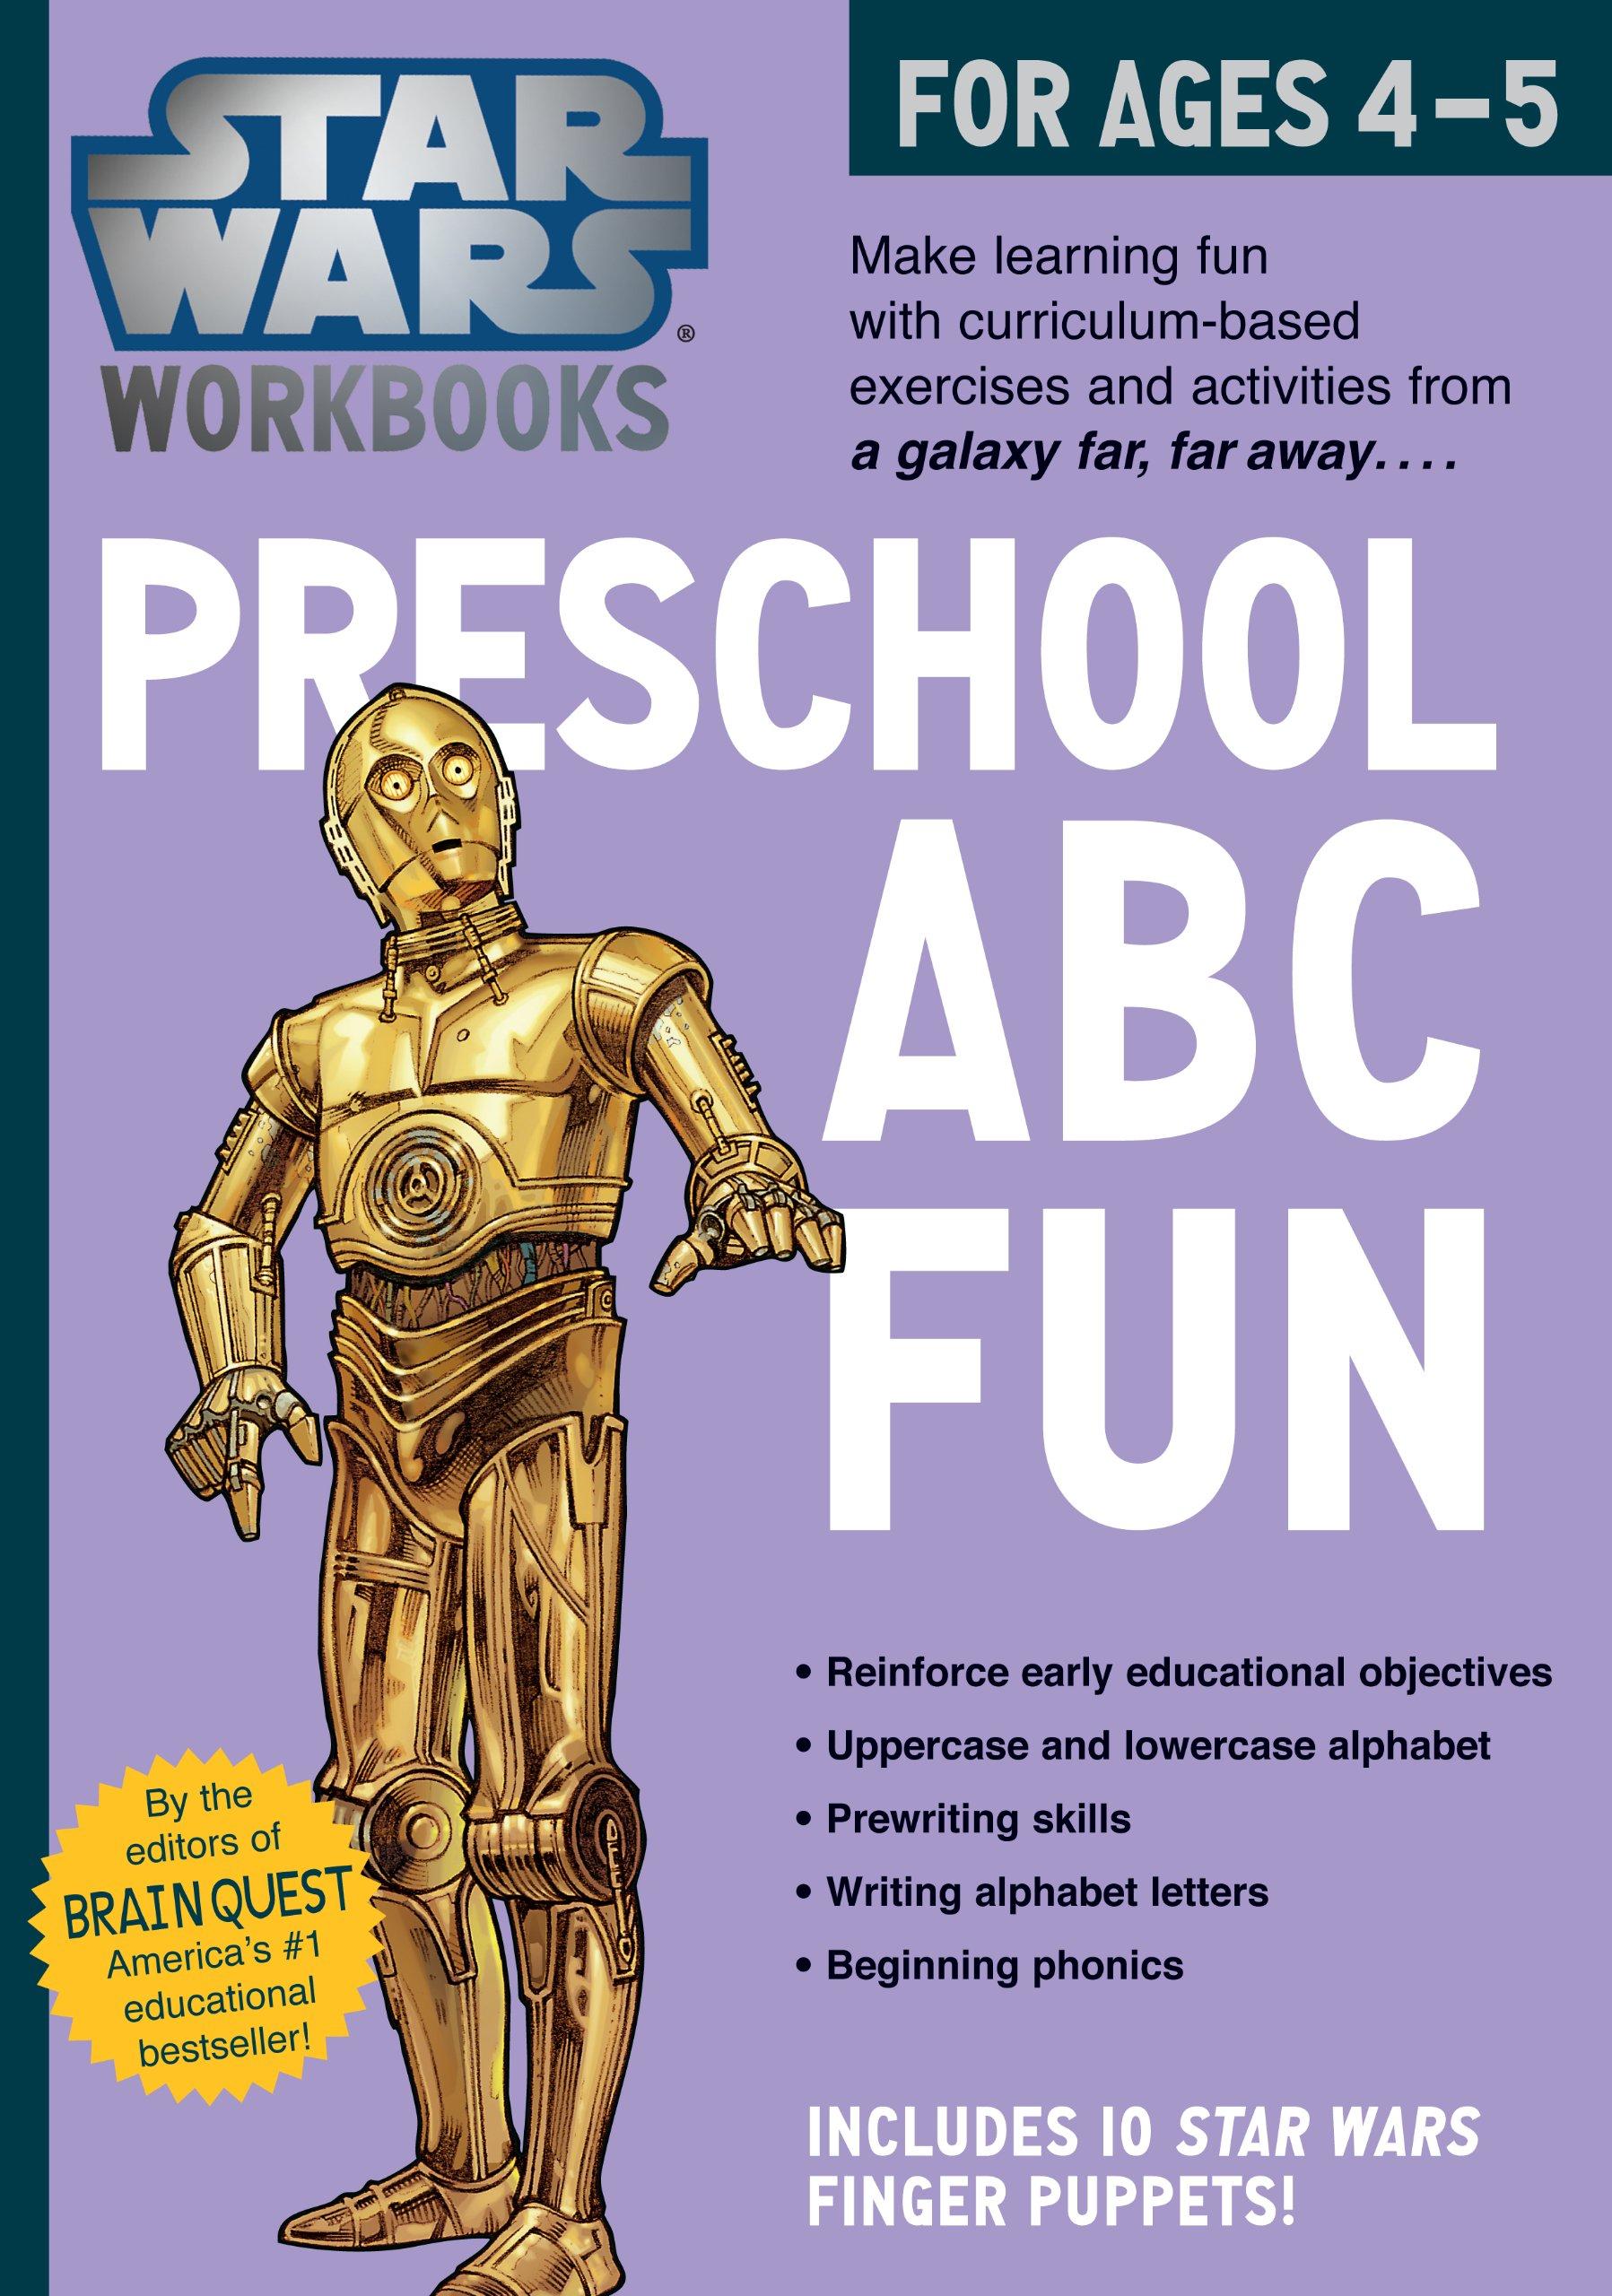 Star Wars Workbook: Preschool ABC Fun Paperback – Jun 17 2014 Workman Publishing Workman Publishing Company 0761178031 Activity Books